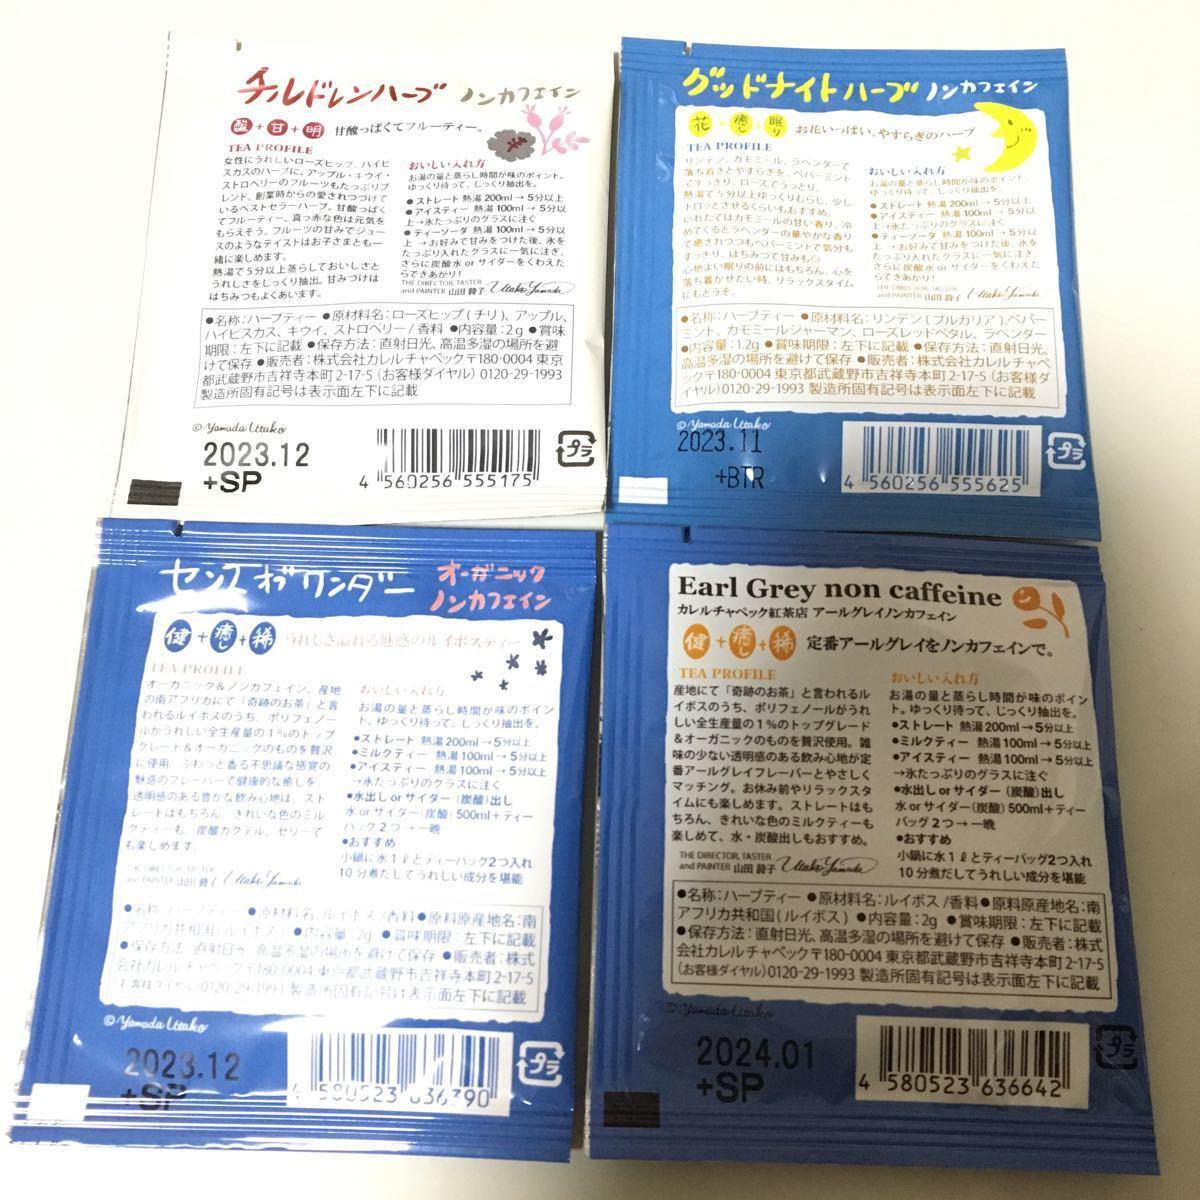 【GW限定お値下】カレルチャペック ノンカフェイン 40パックセット